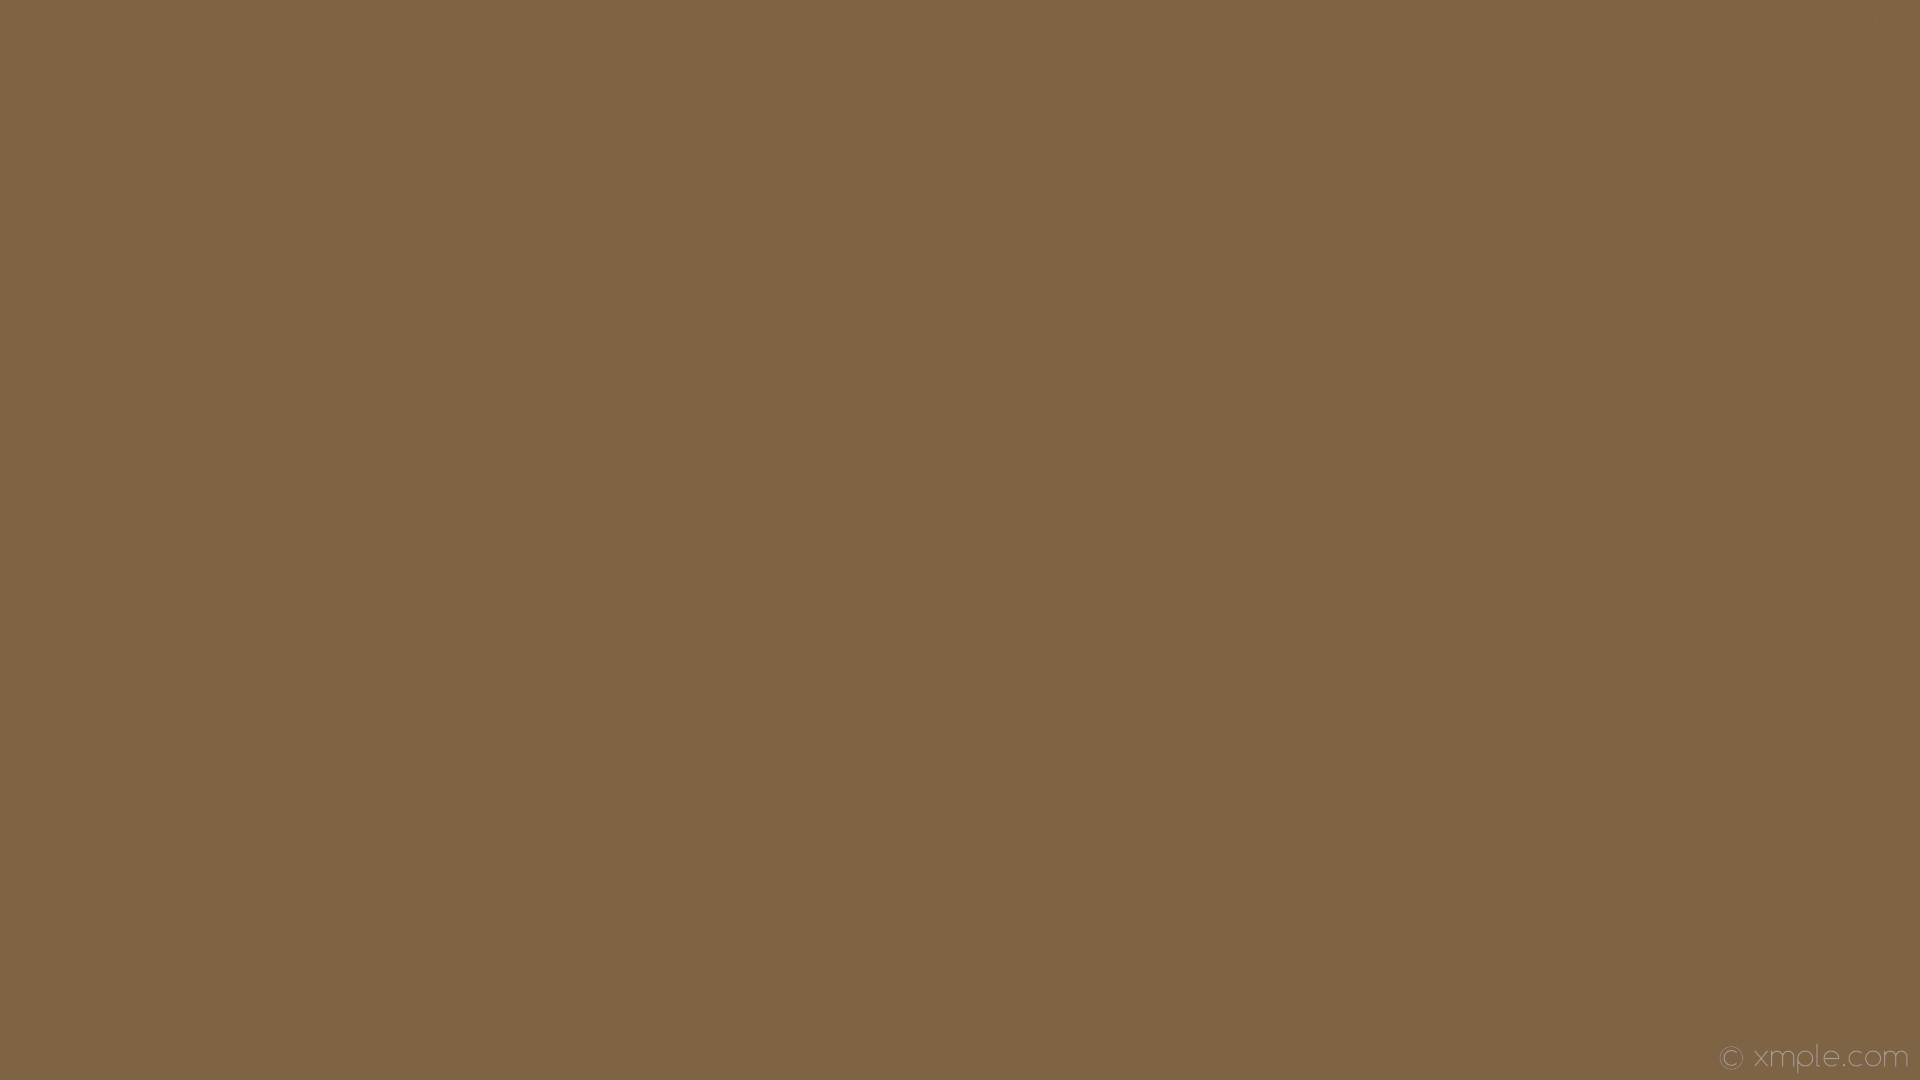 wallpaper plain solid color one colour orange single #7f6345